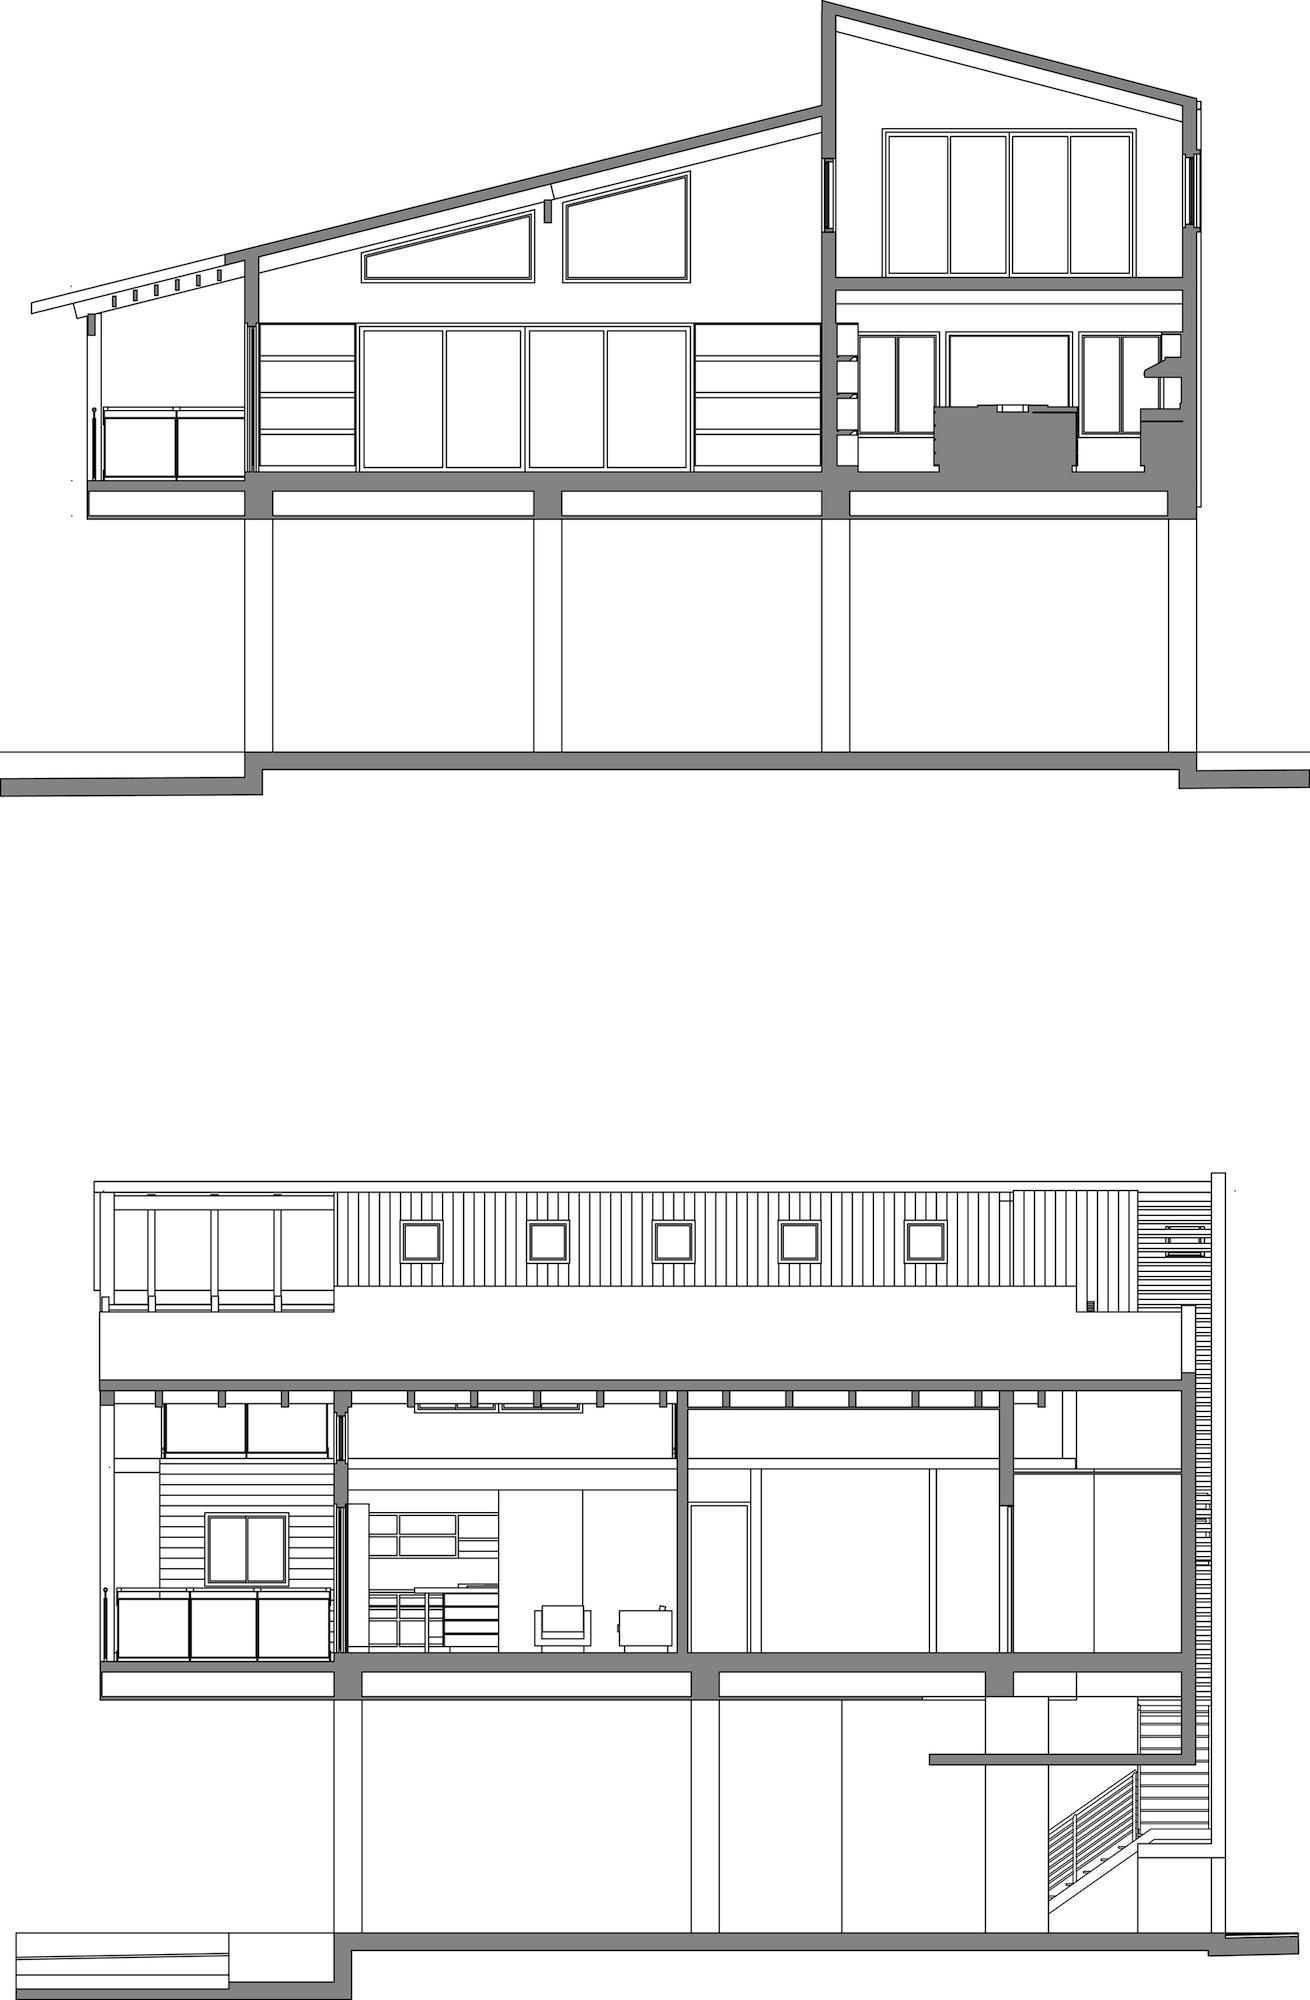 residencia-tavernier-drive-luis-pons-design-lab_101-house_renovation_-_tavernier_key_fl-_sections